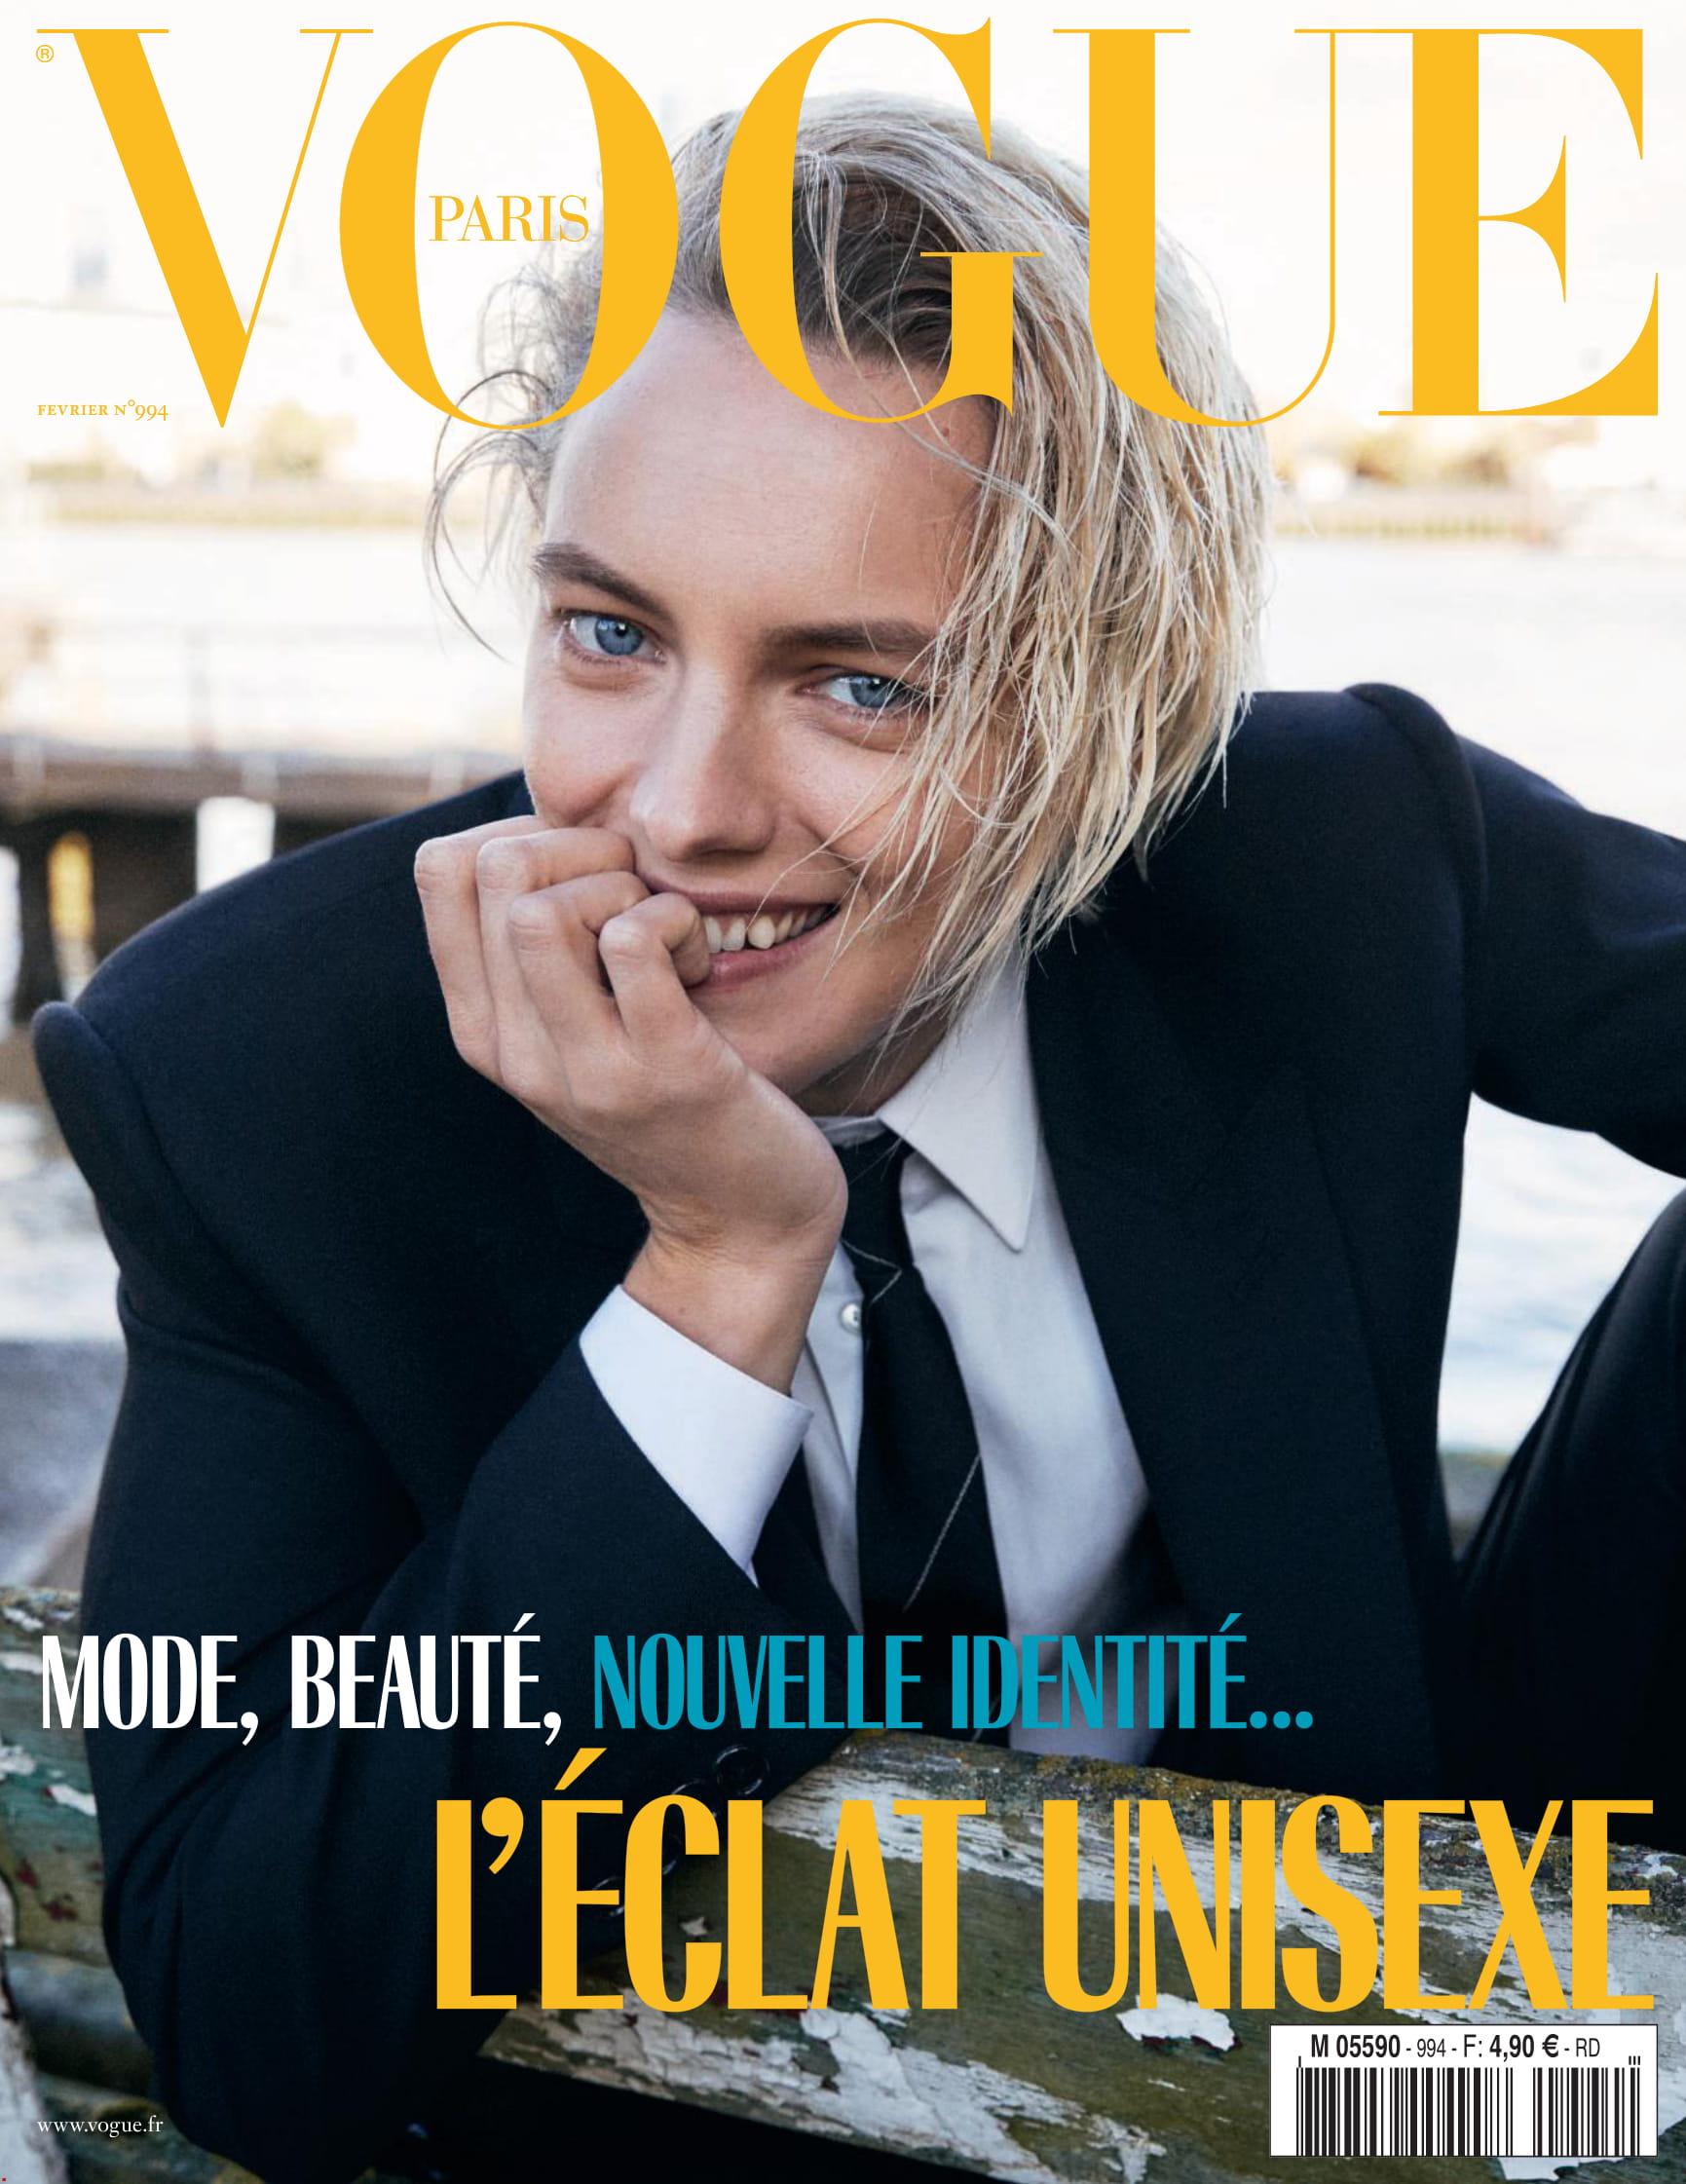 Erika Linder by Mikael Jansson for Vogue Paris Feb 2019 (11).jpg